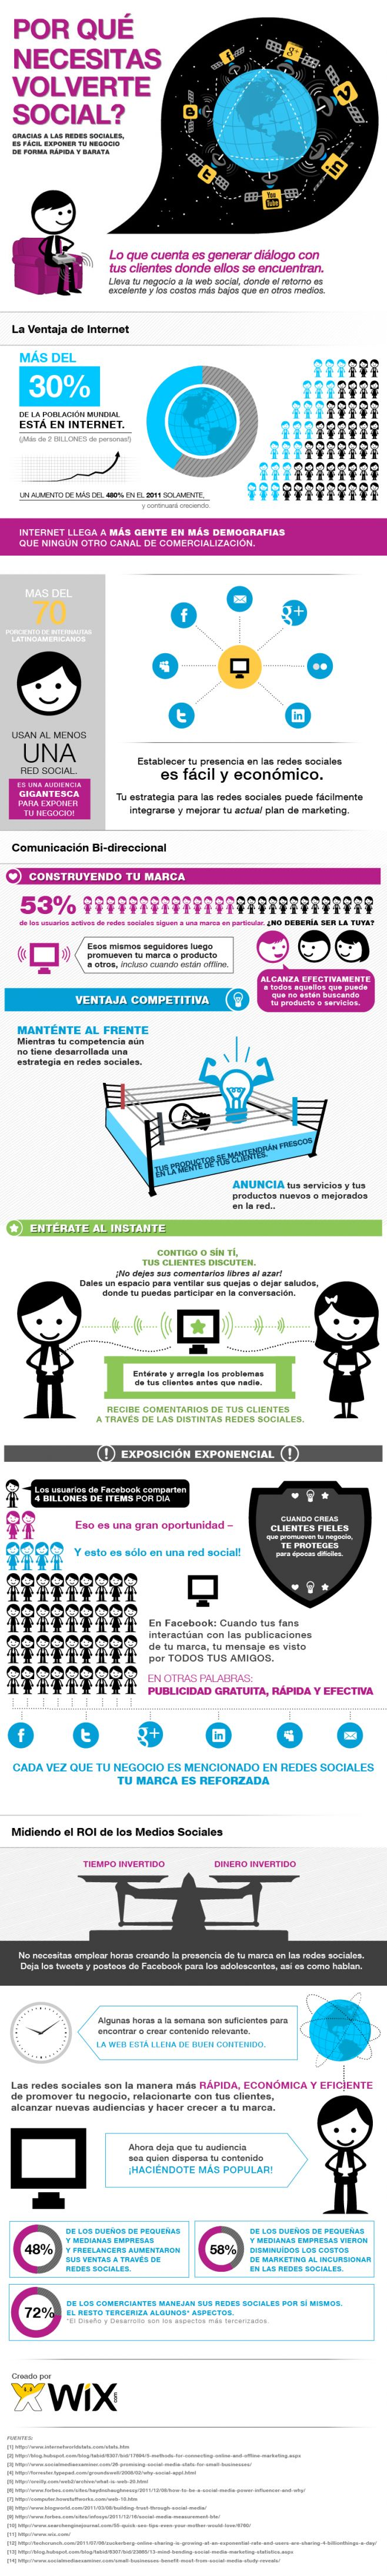 Por qué necesitas volverte Social #infografia #infographic #socialmedia